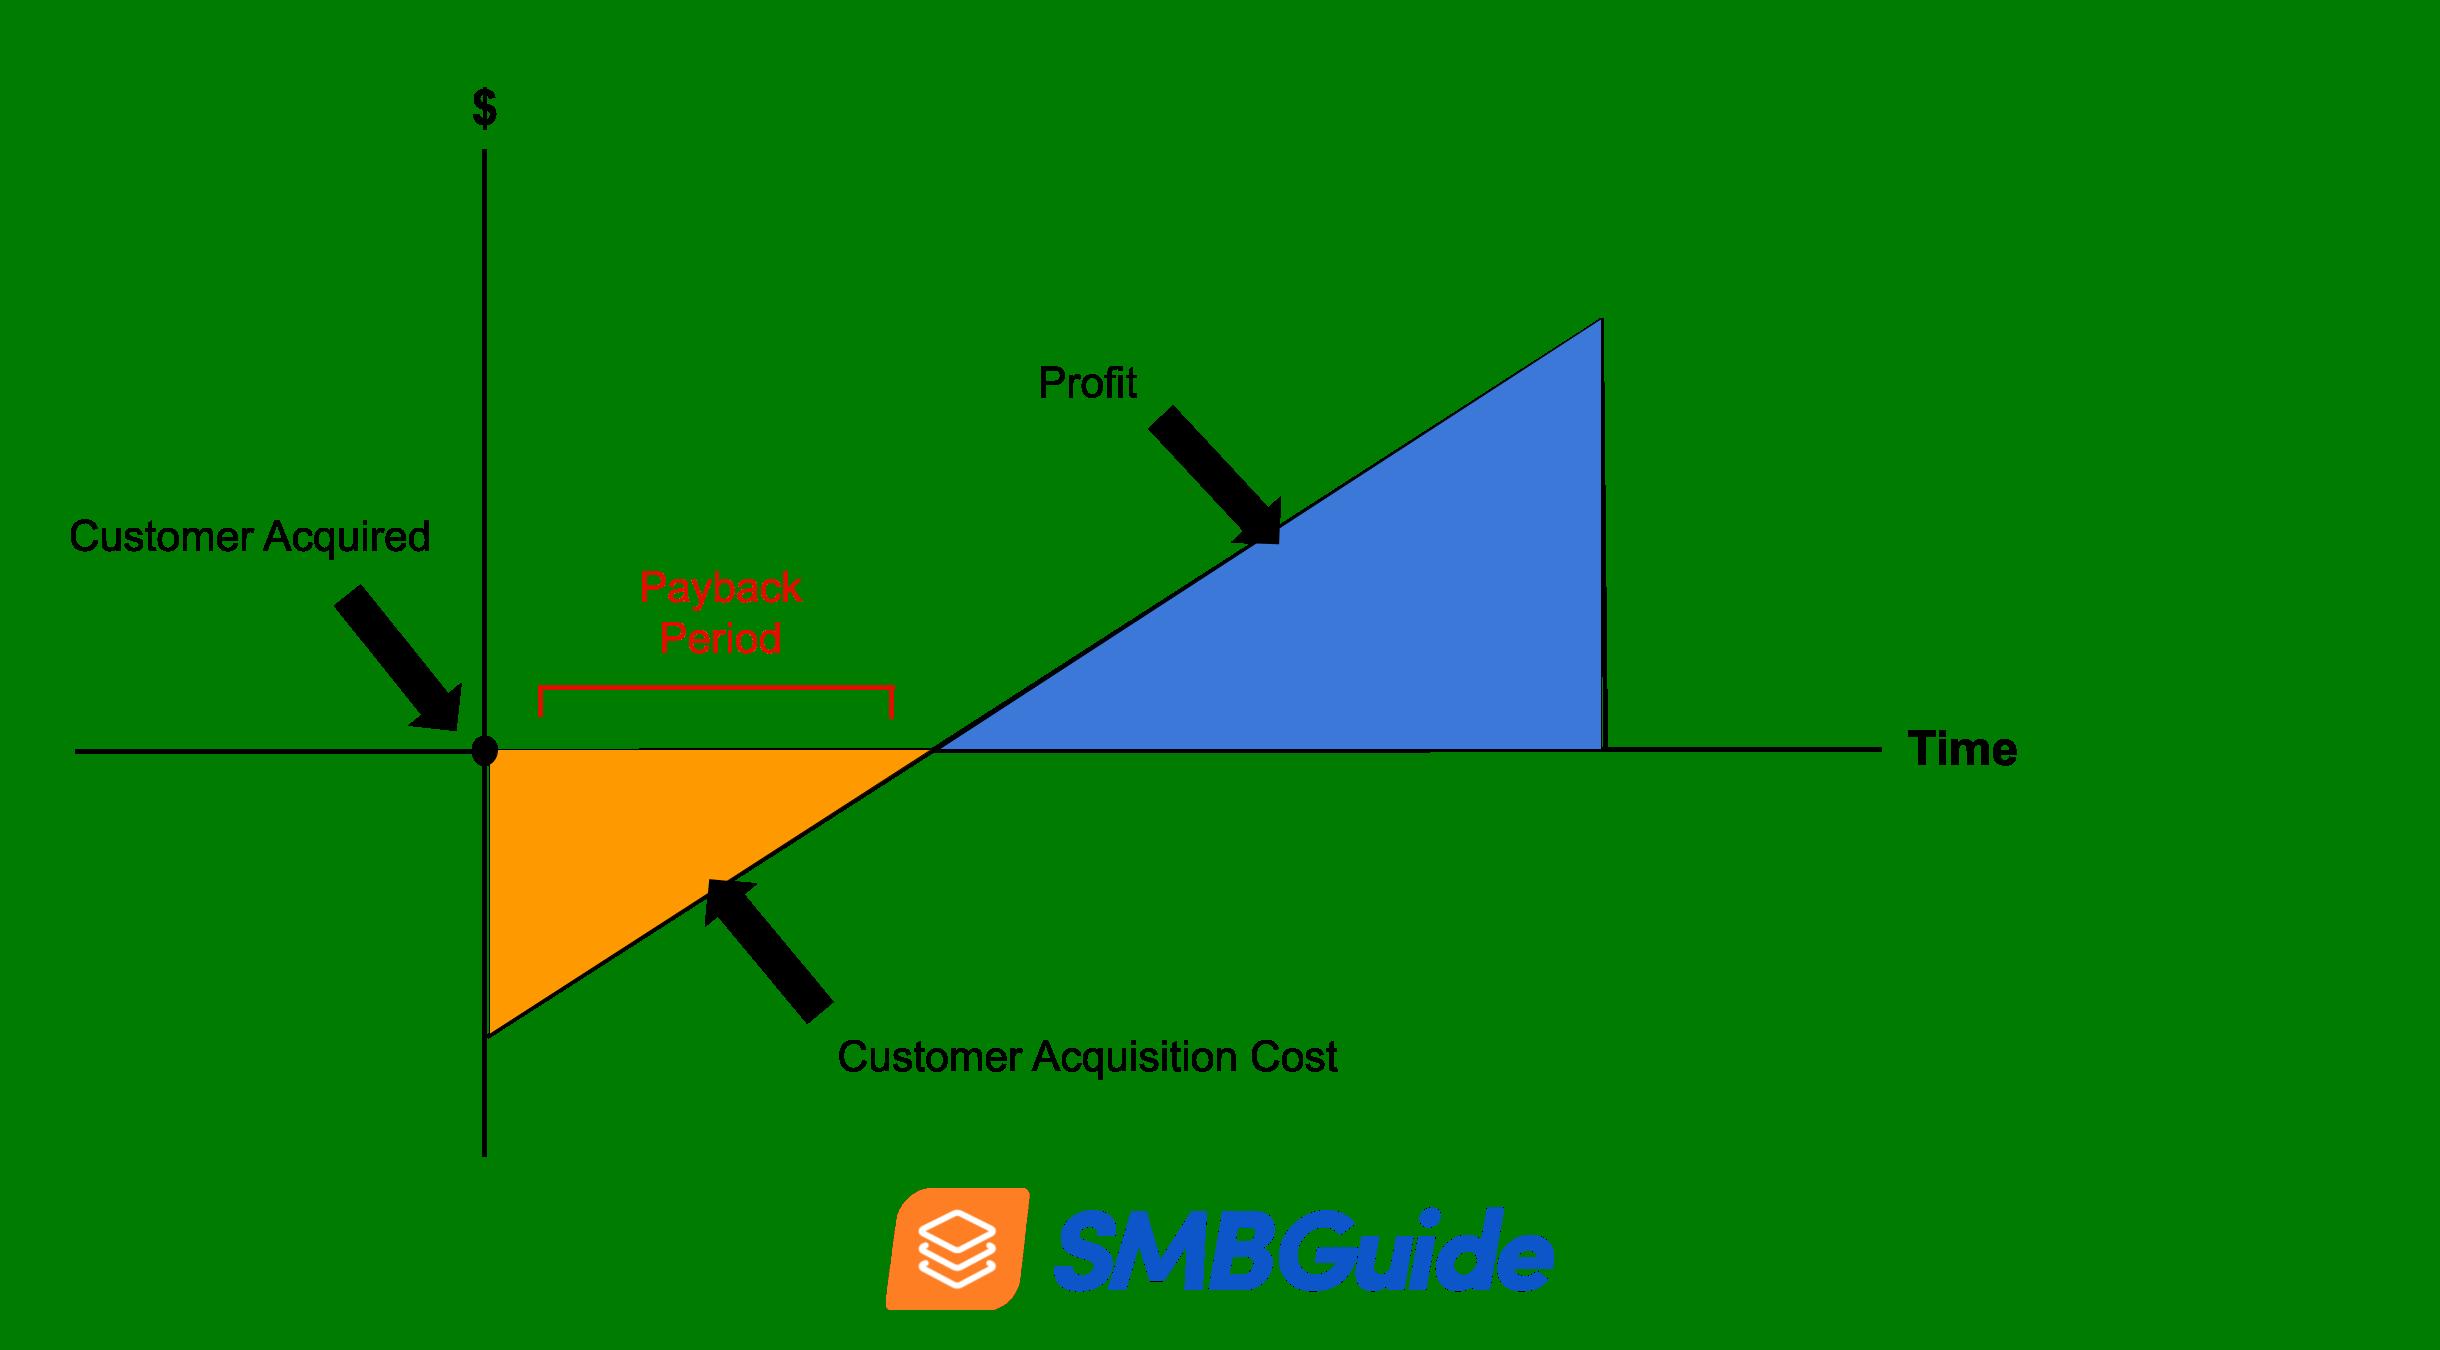 Cac Payback Period Diagram